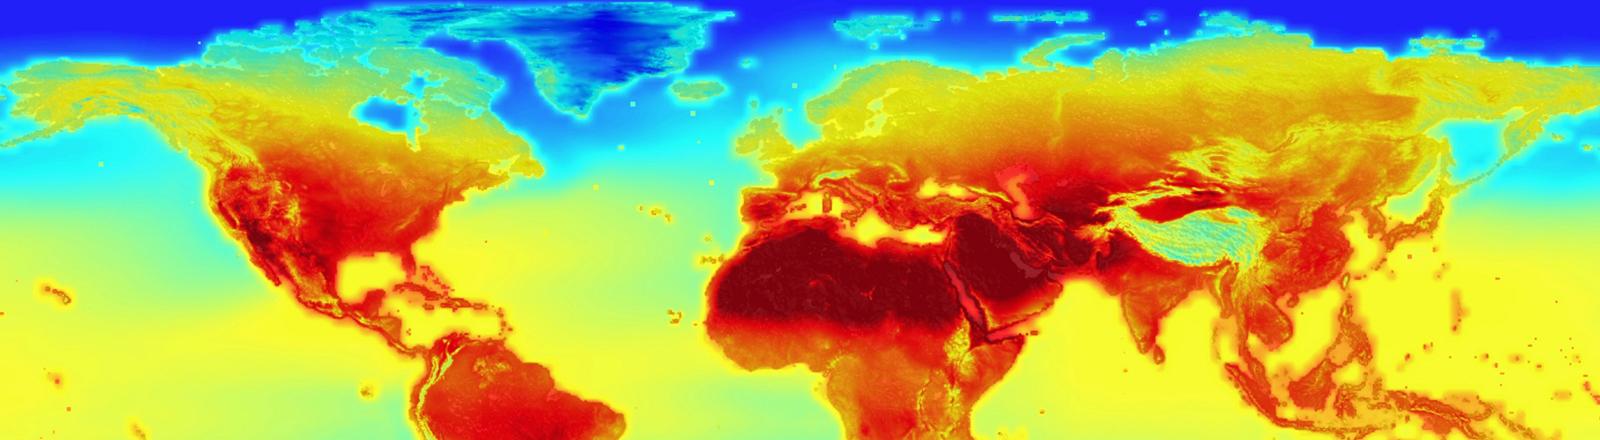 Nasa-Projektion zum Klimawandel